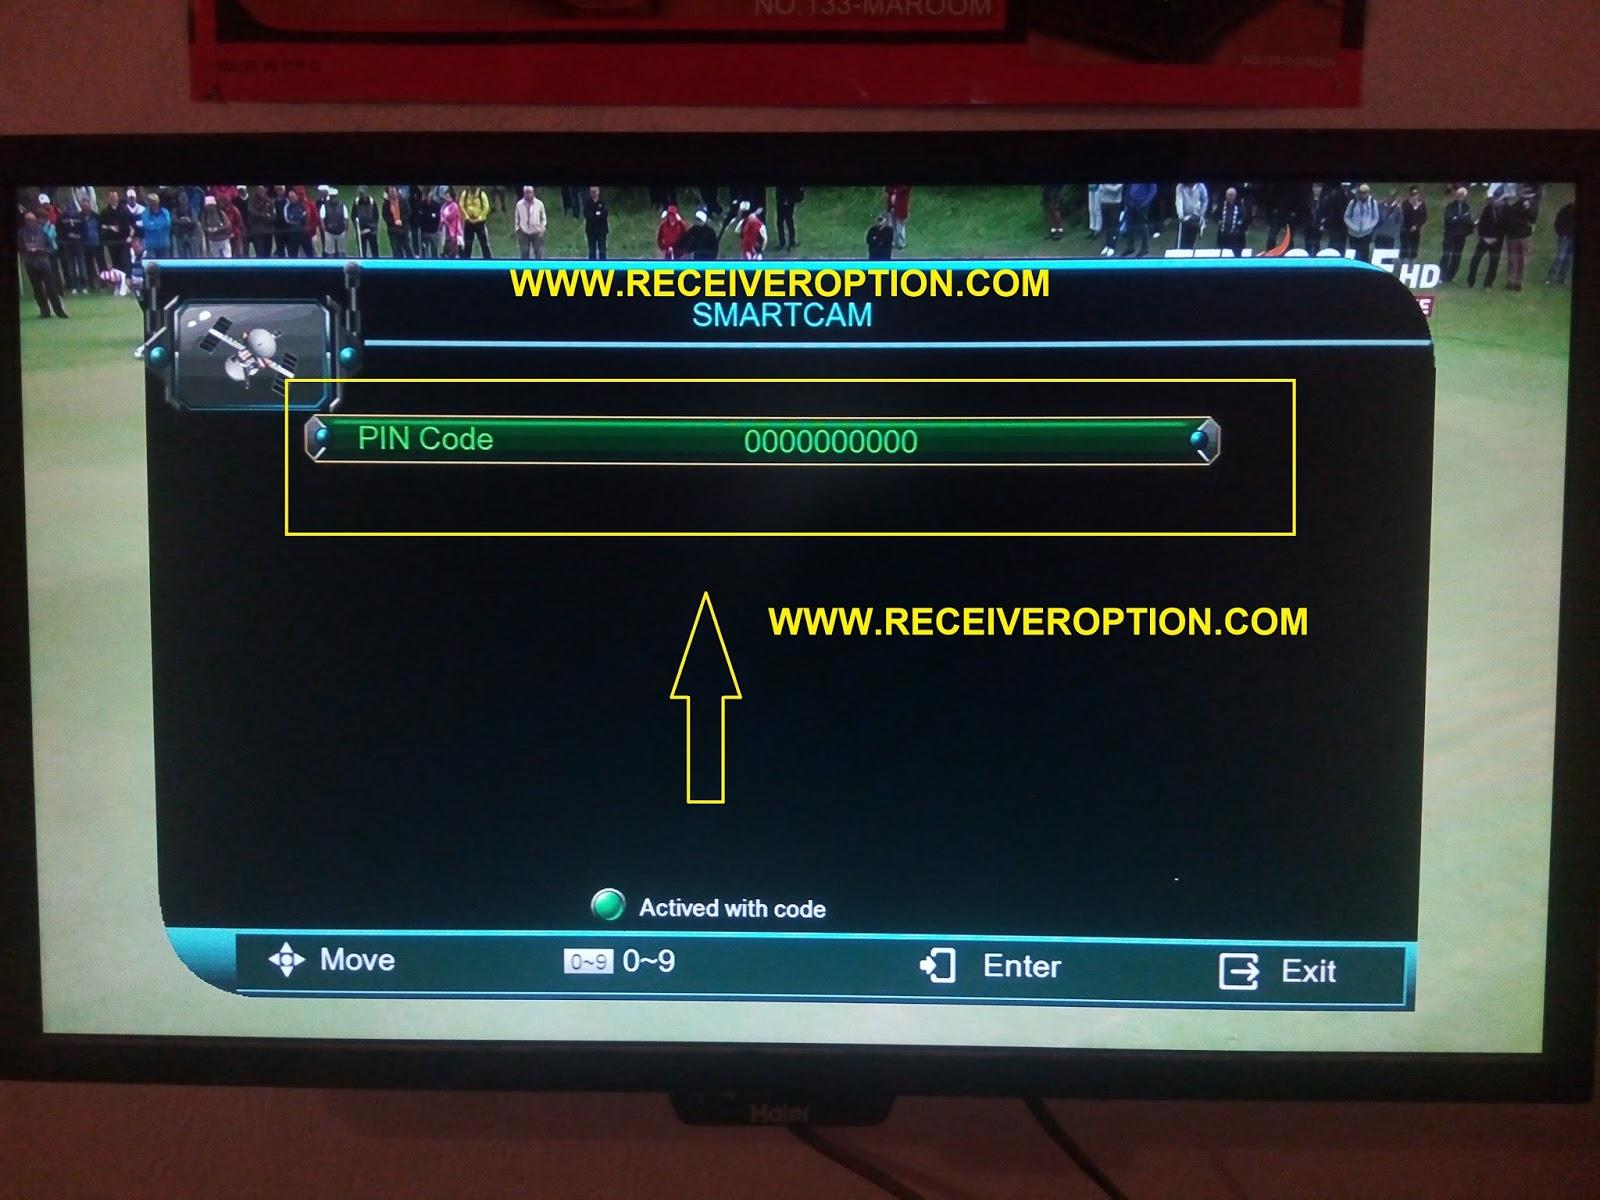 Smartcam (dishtv/videocon hd) - SatelliteTV Fans - IPTV Fans